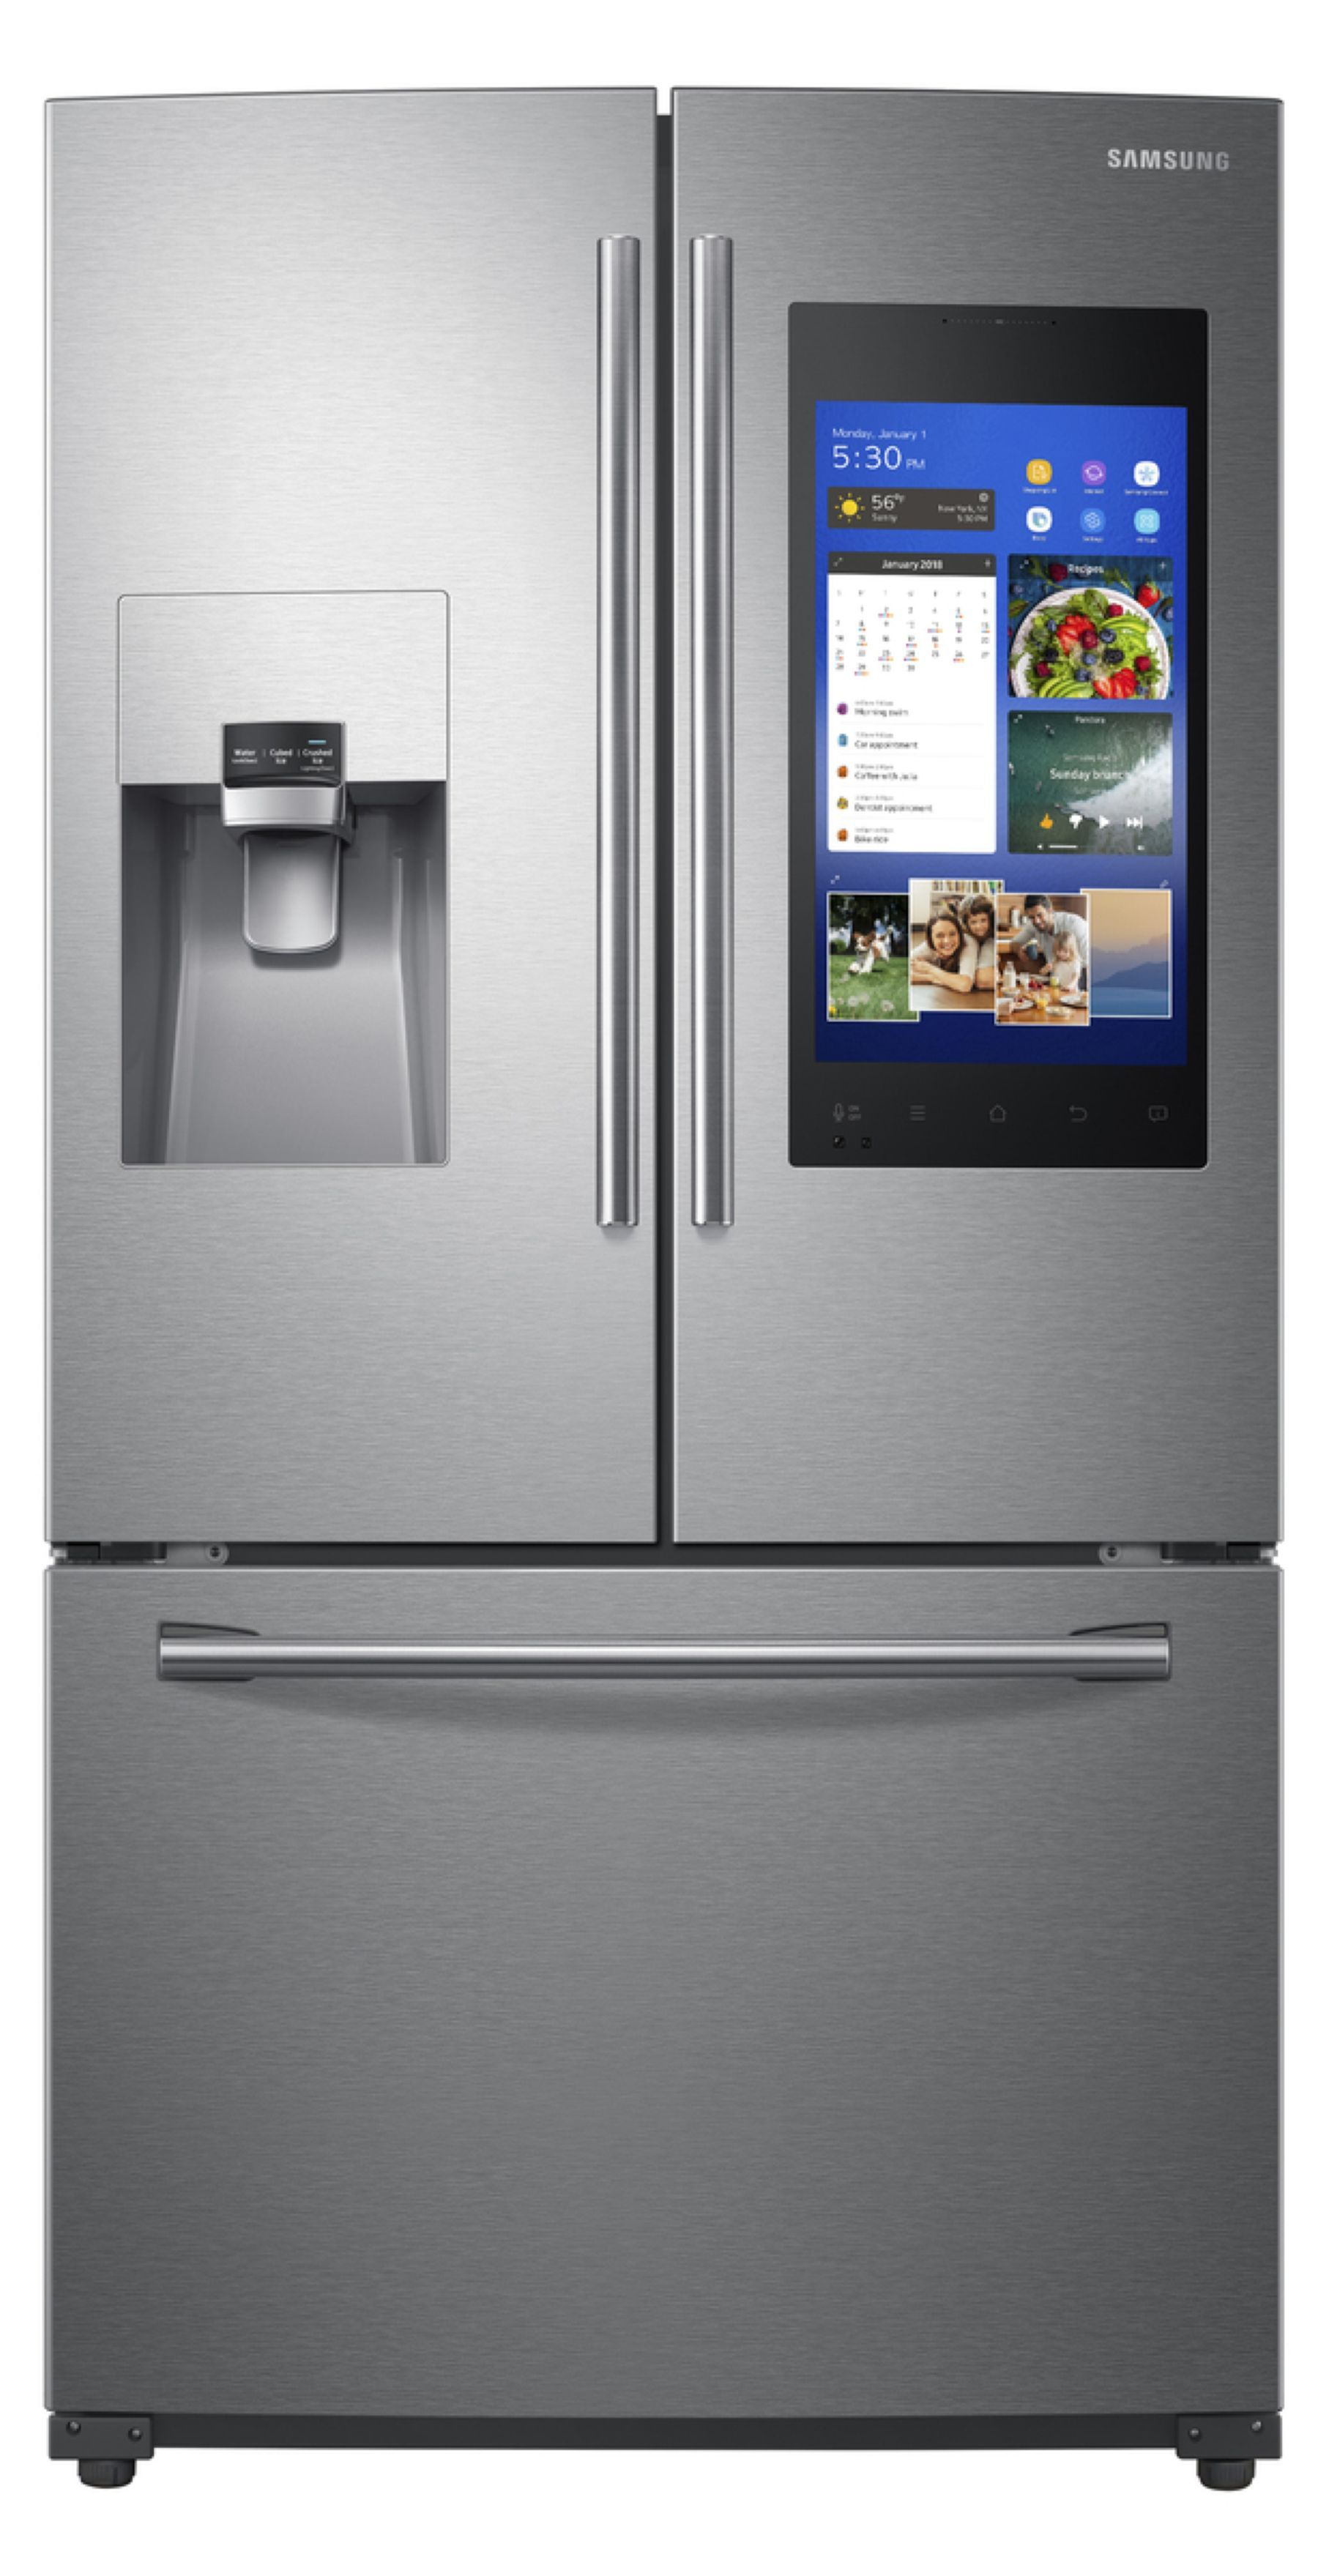 Sears Online French Door Refrigerator Stainless Steel